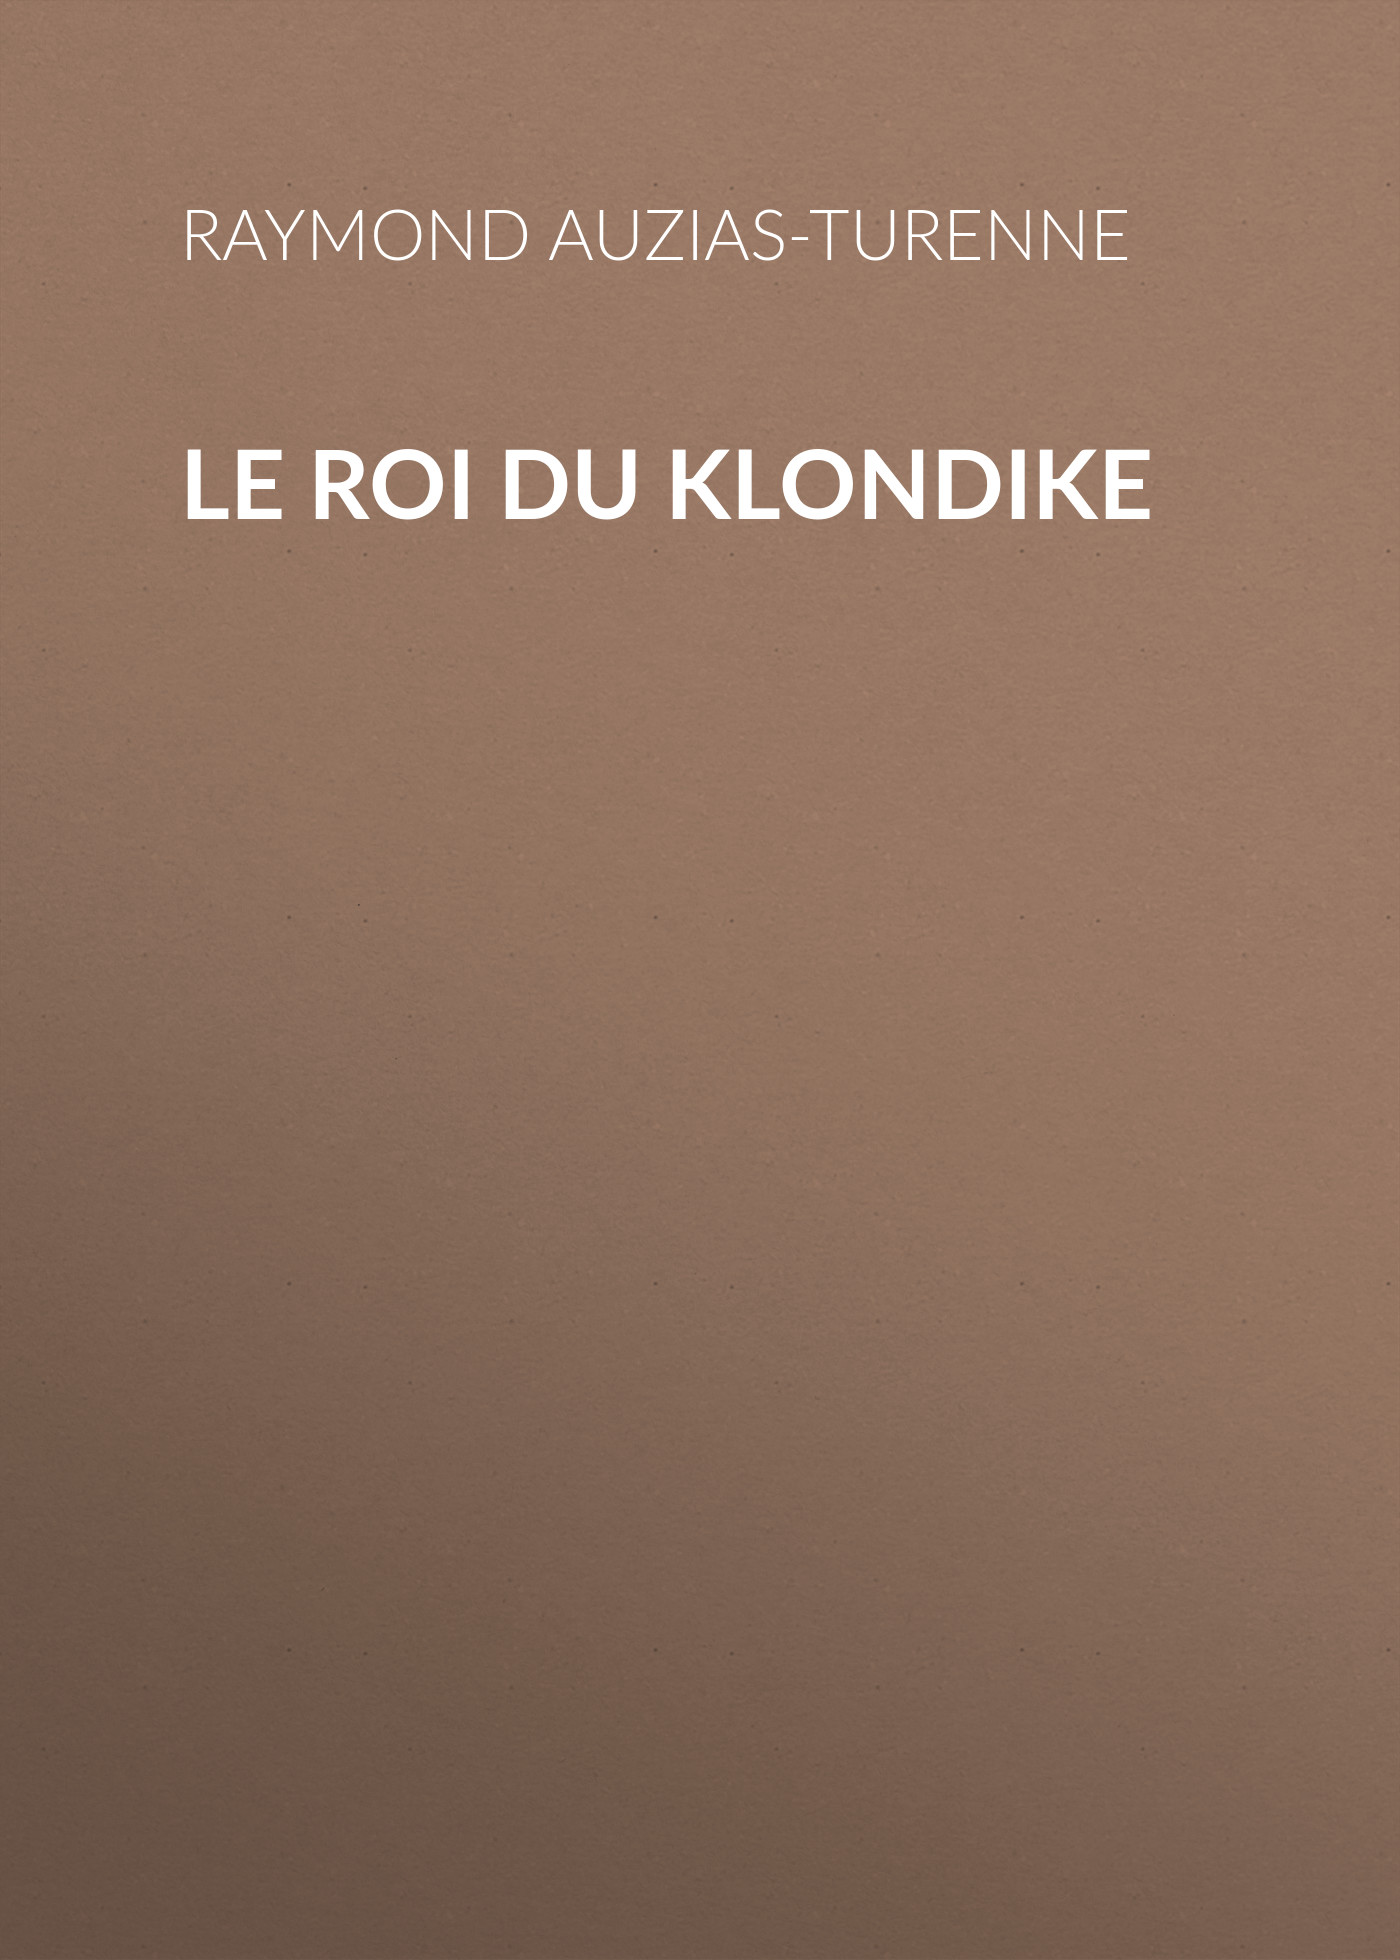 Auzias-Turenne Raymond Le roi du Klondike enigma enigma le roi est mort vive le roi iii lp